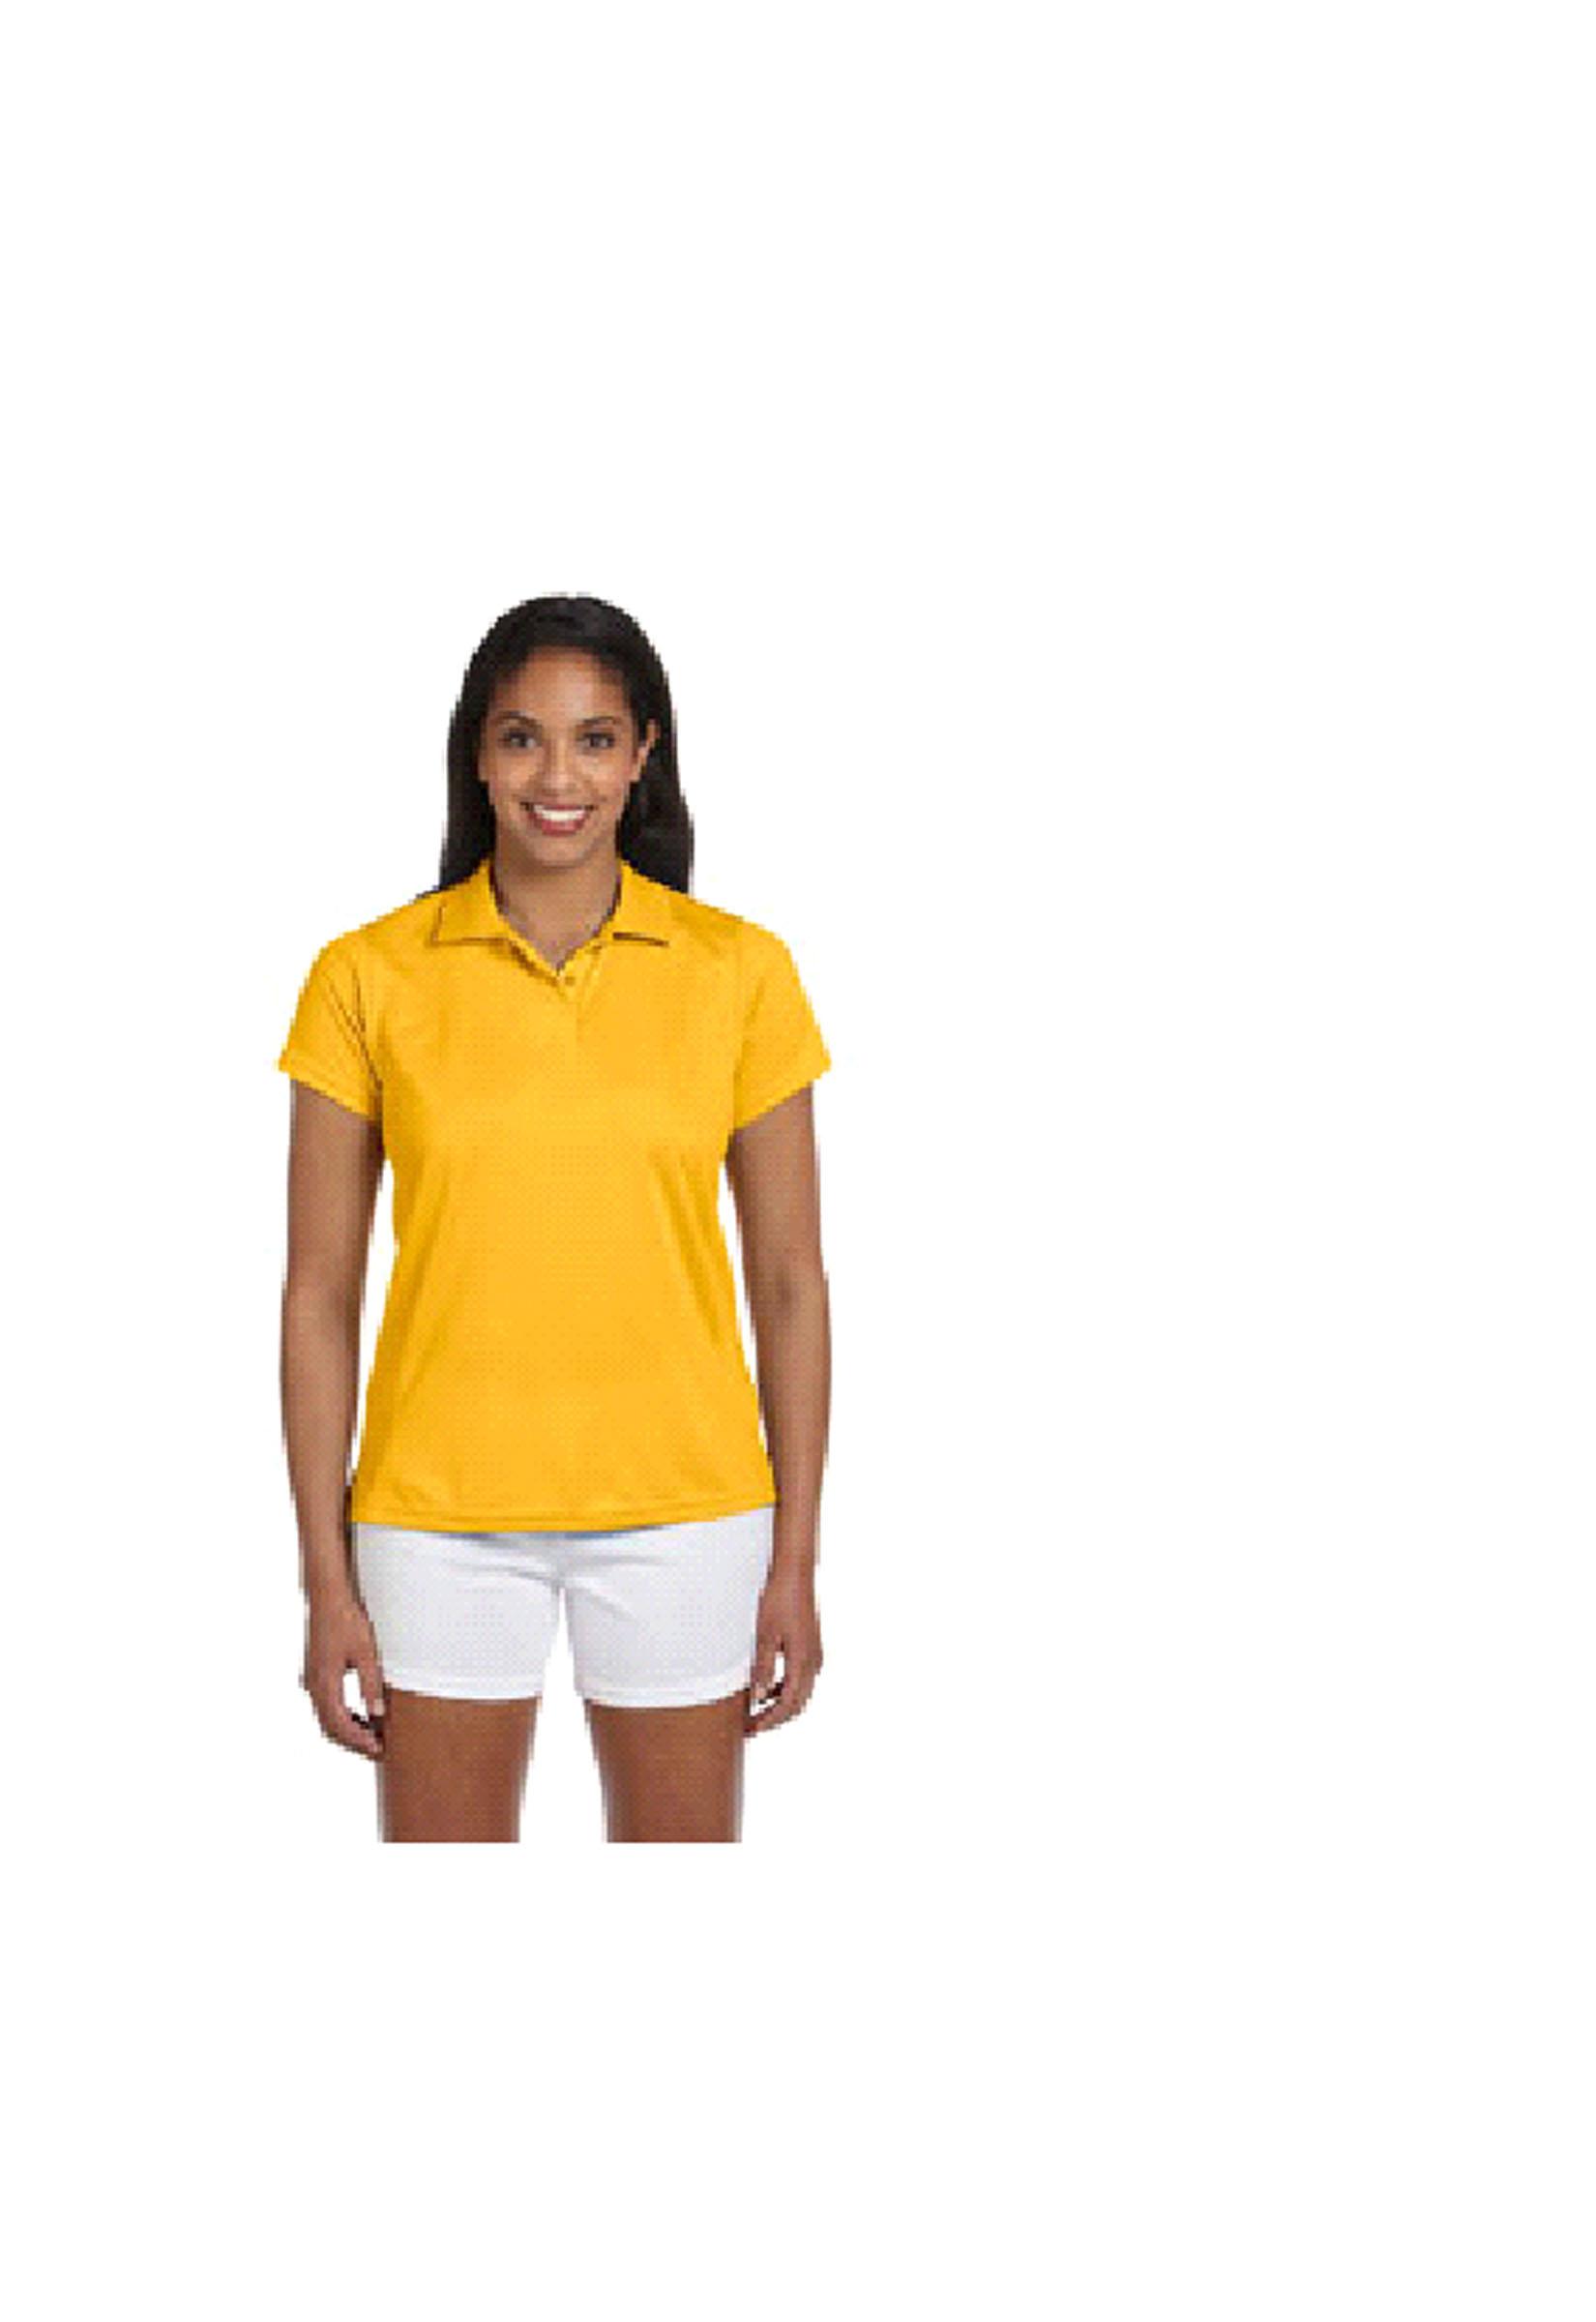 Click image for larger version  Name:Ladies Shirt.jpg Views:35 Size:195.3 KB ID:2003632